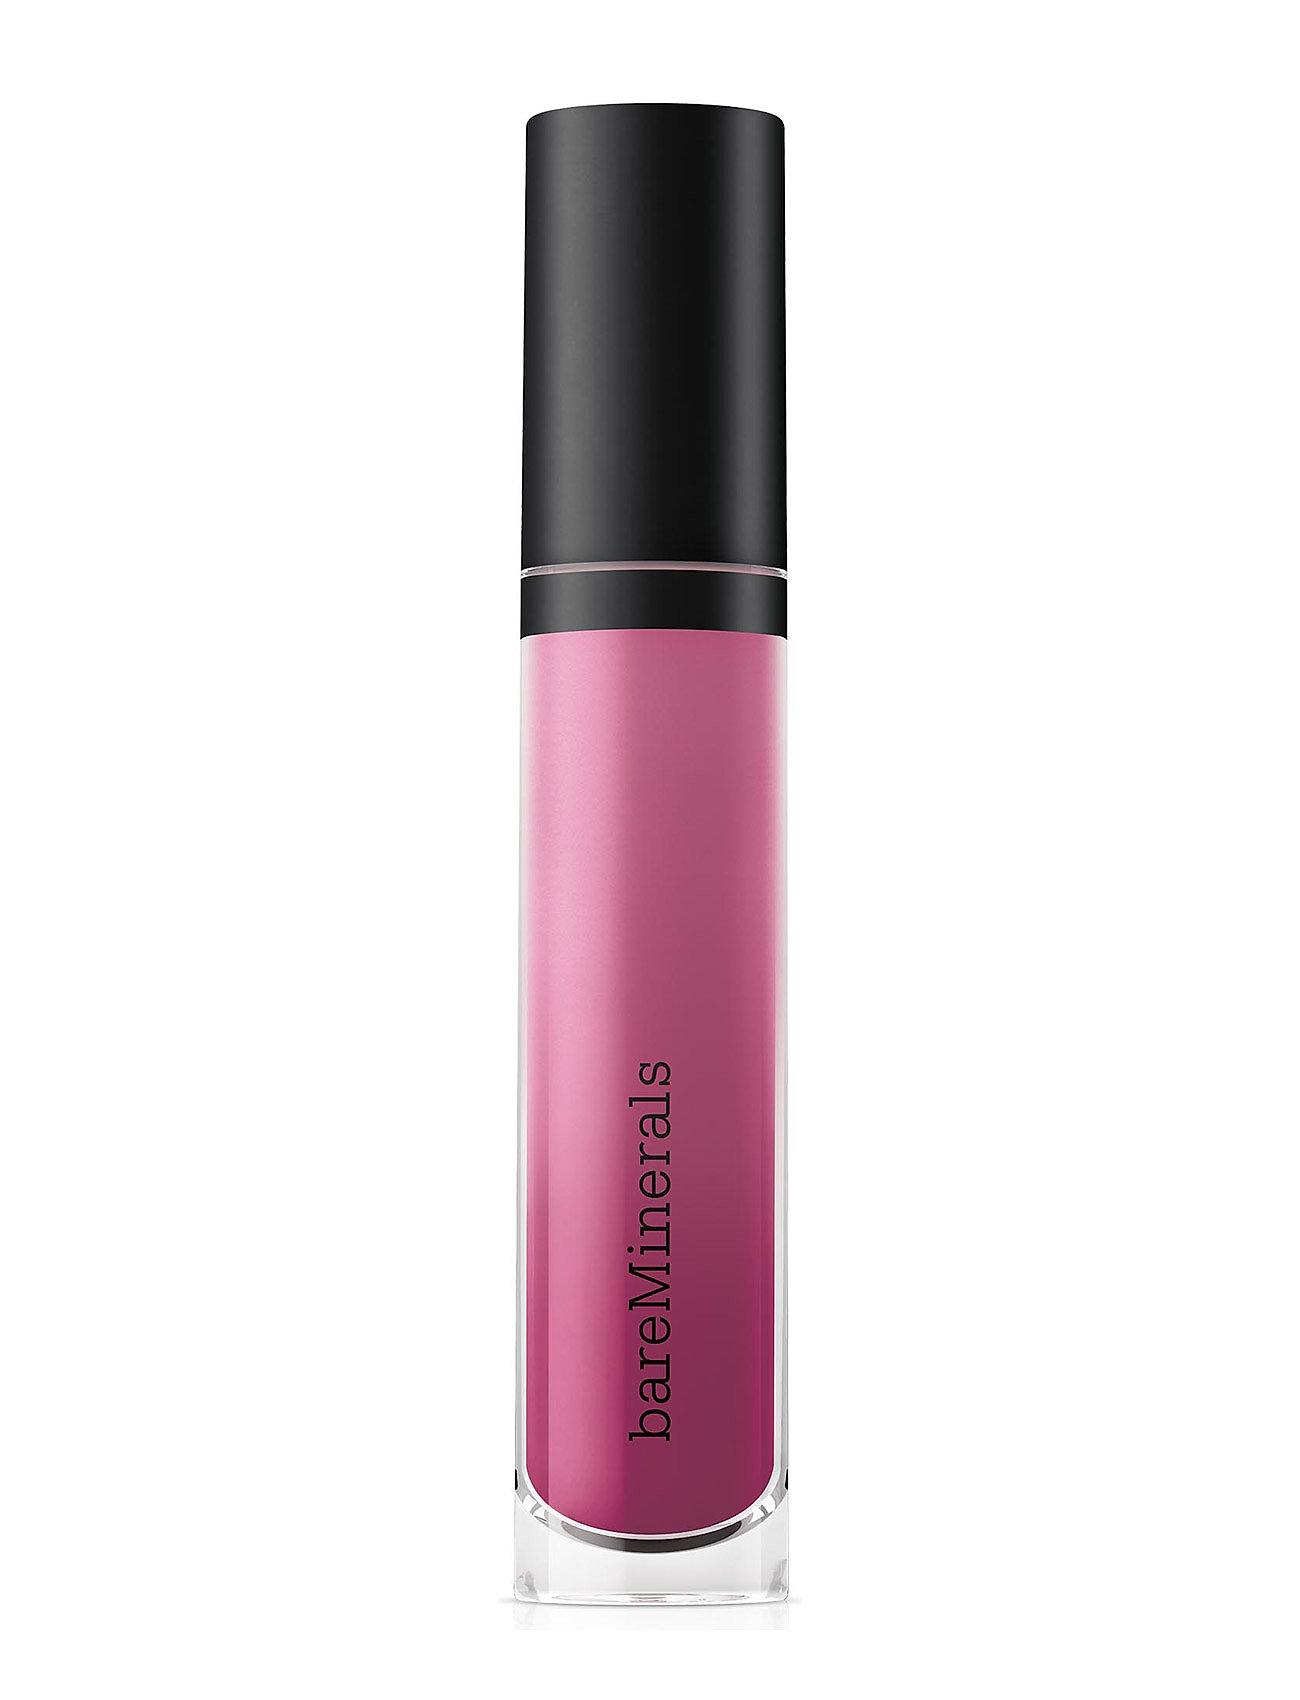 Image of Statement Matte Liquid Lipcolor Lipgloss Makeup Lyserød BareMinerals (3067521909)